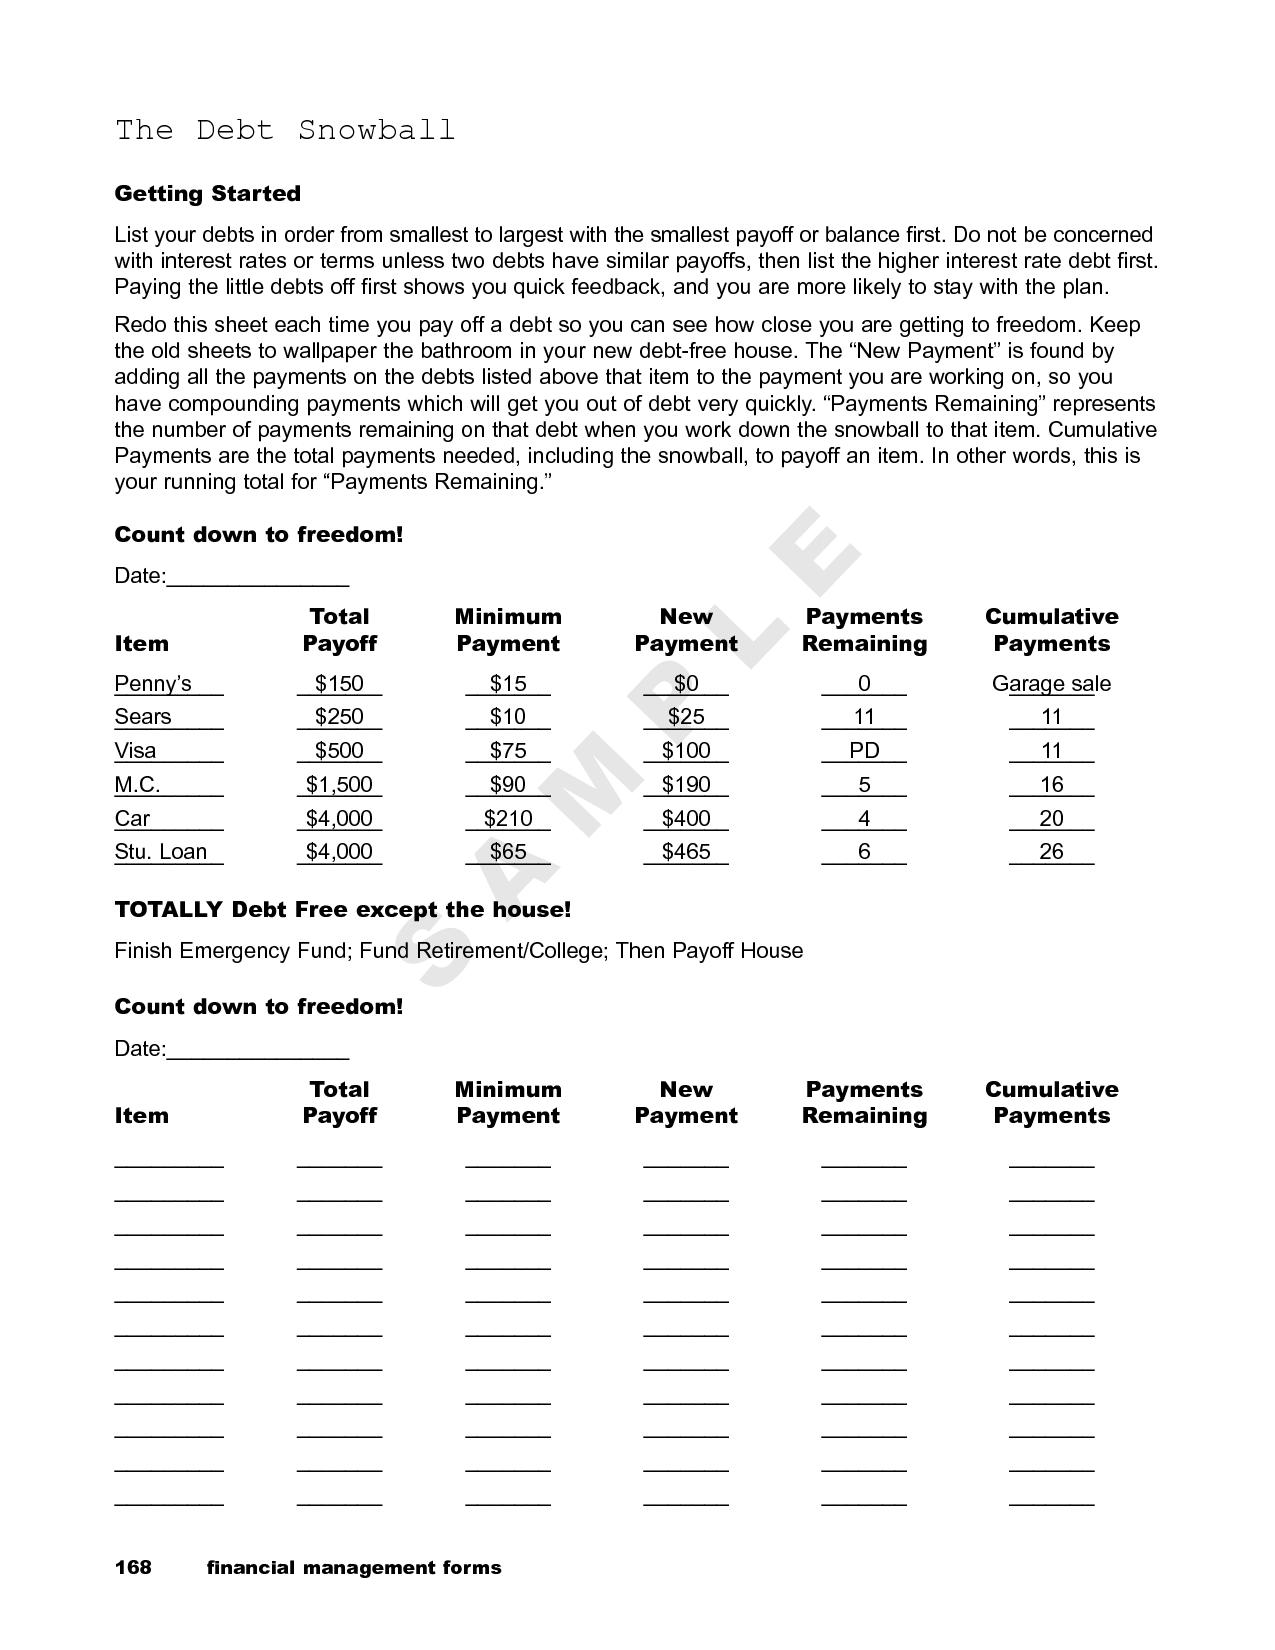 Dave Ramsey Debt Snowball Spreadsheet